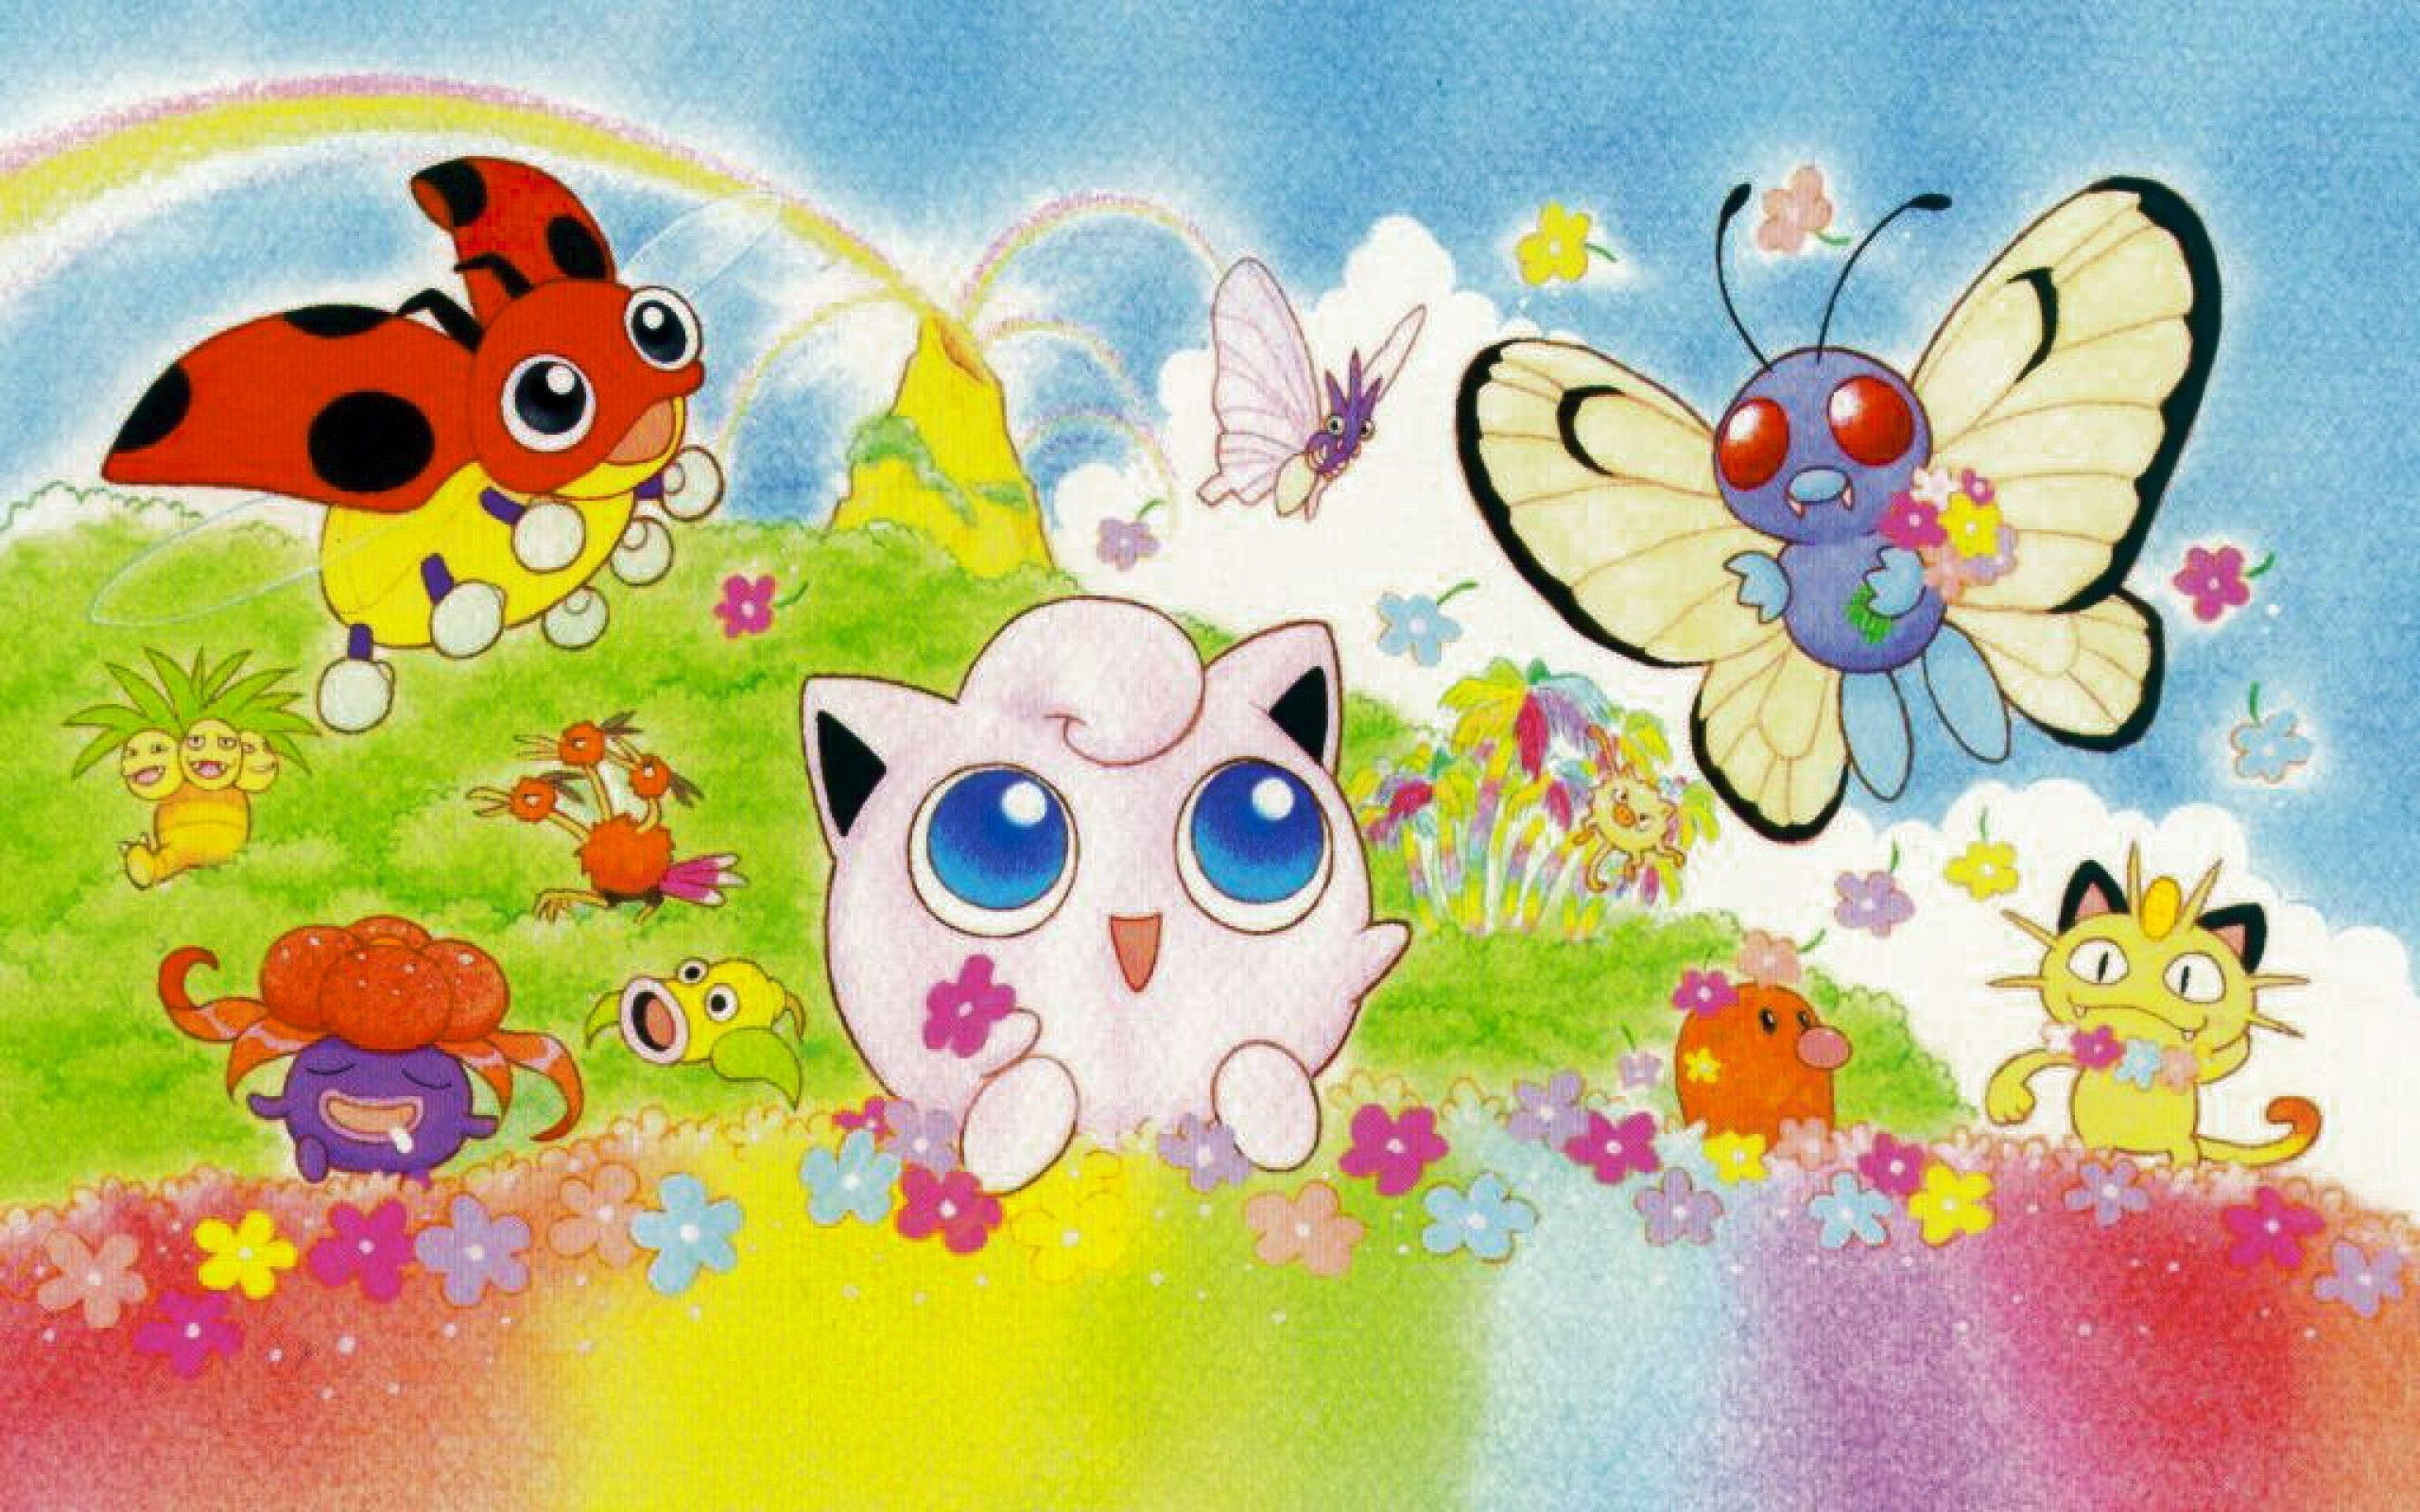 Cute Pokemon Wallpaper Background